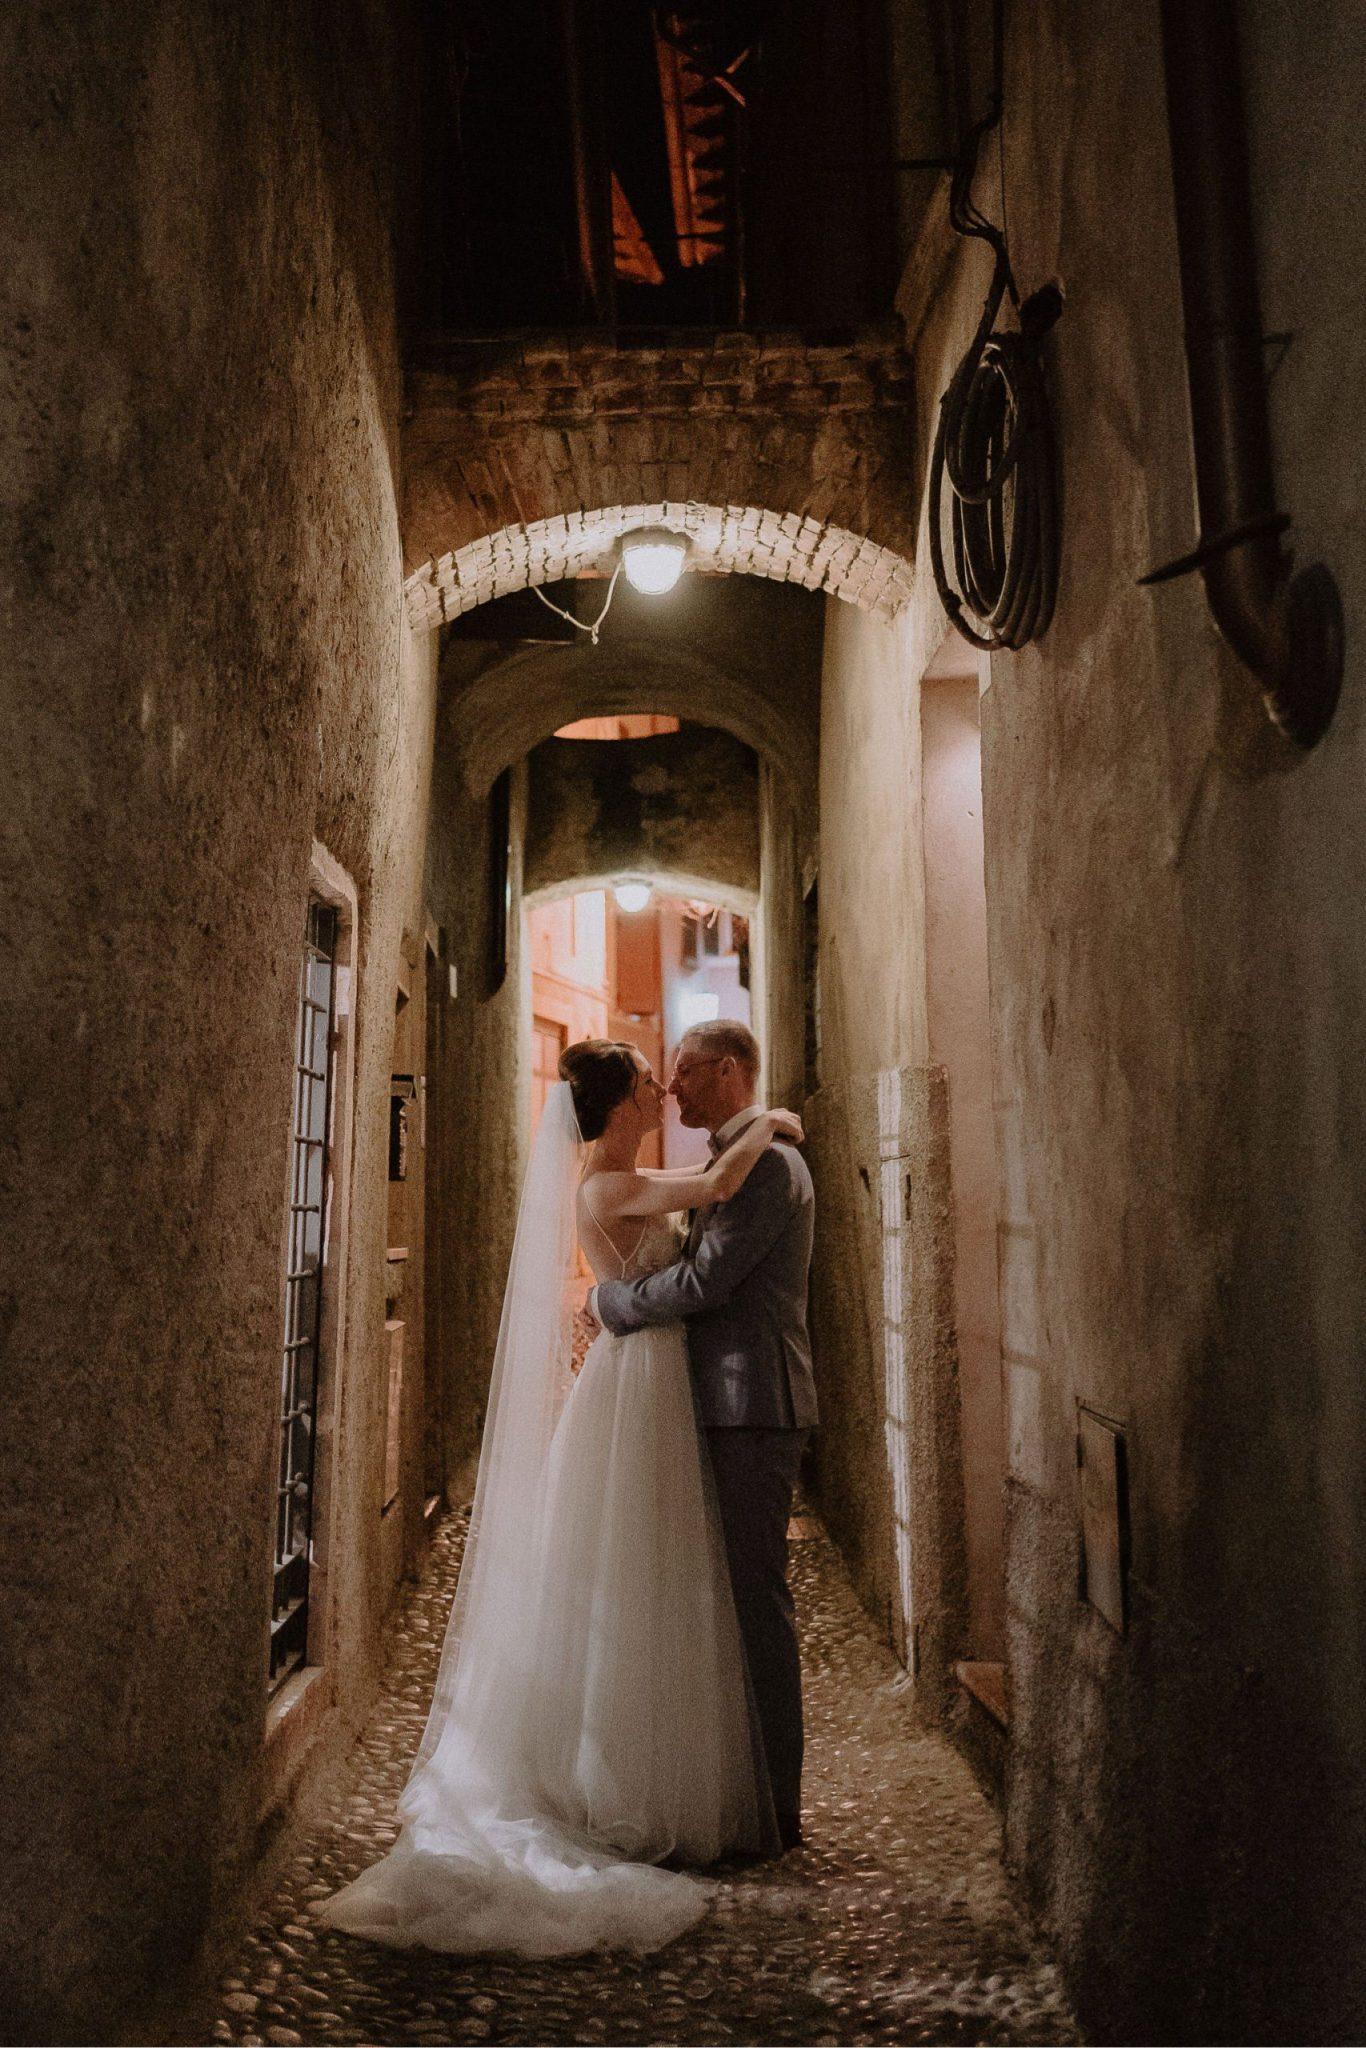 64 la 04 abend 1200 weddinphotographer Hochzeitsfotograf newzealand hamilton Weddingphotography Stuttgart scaled